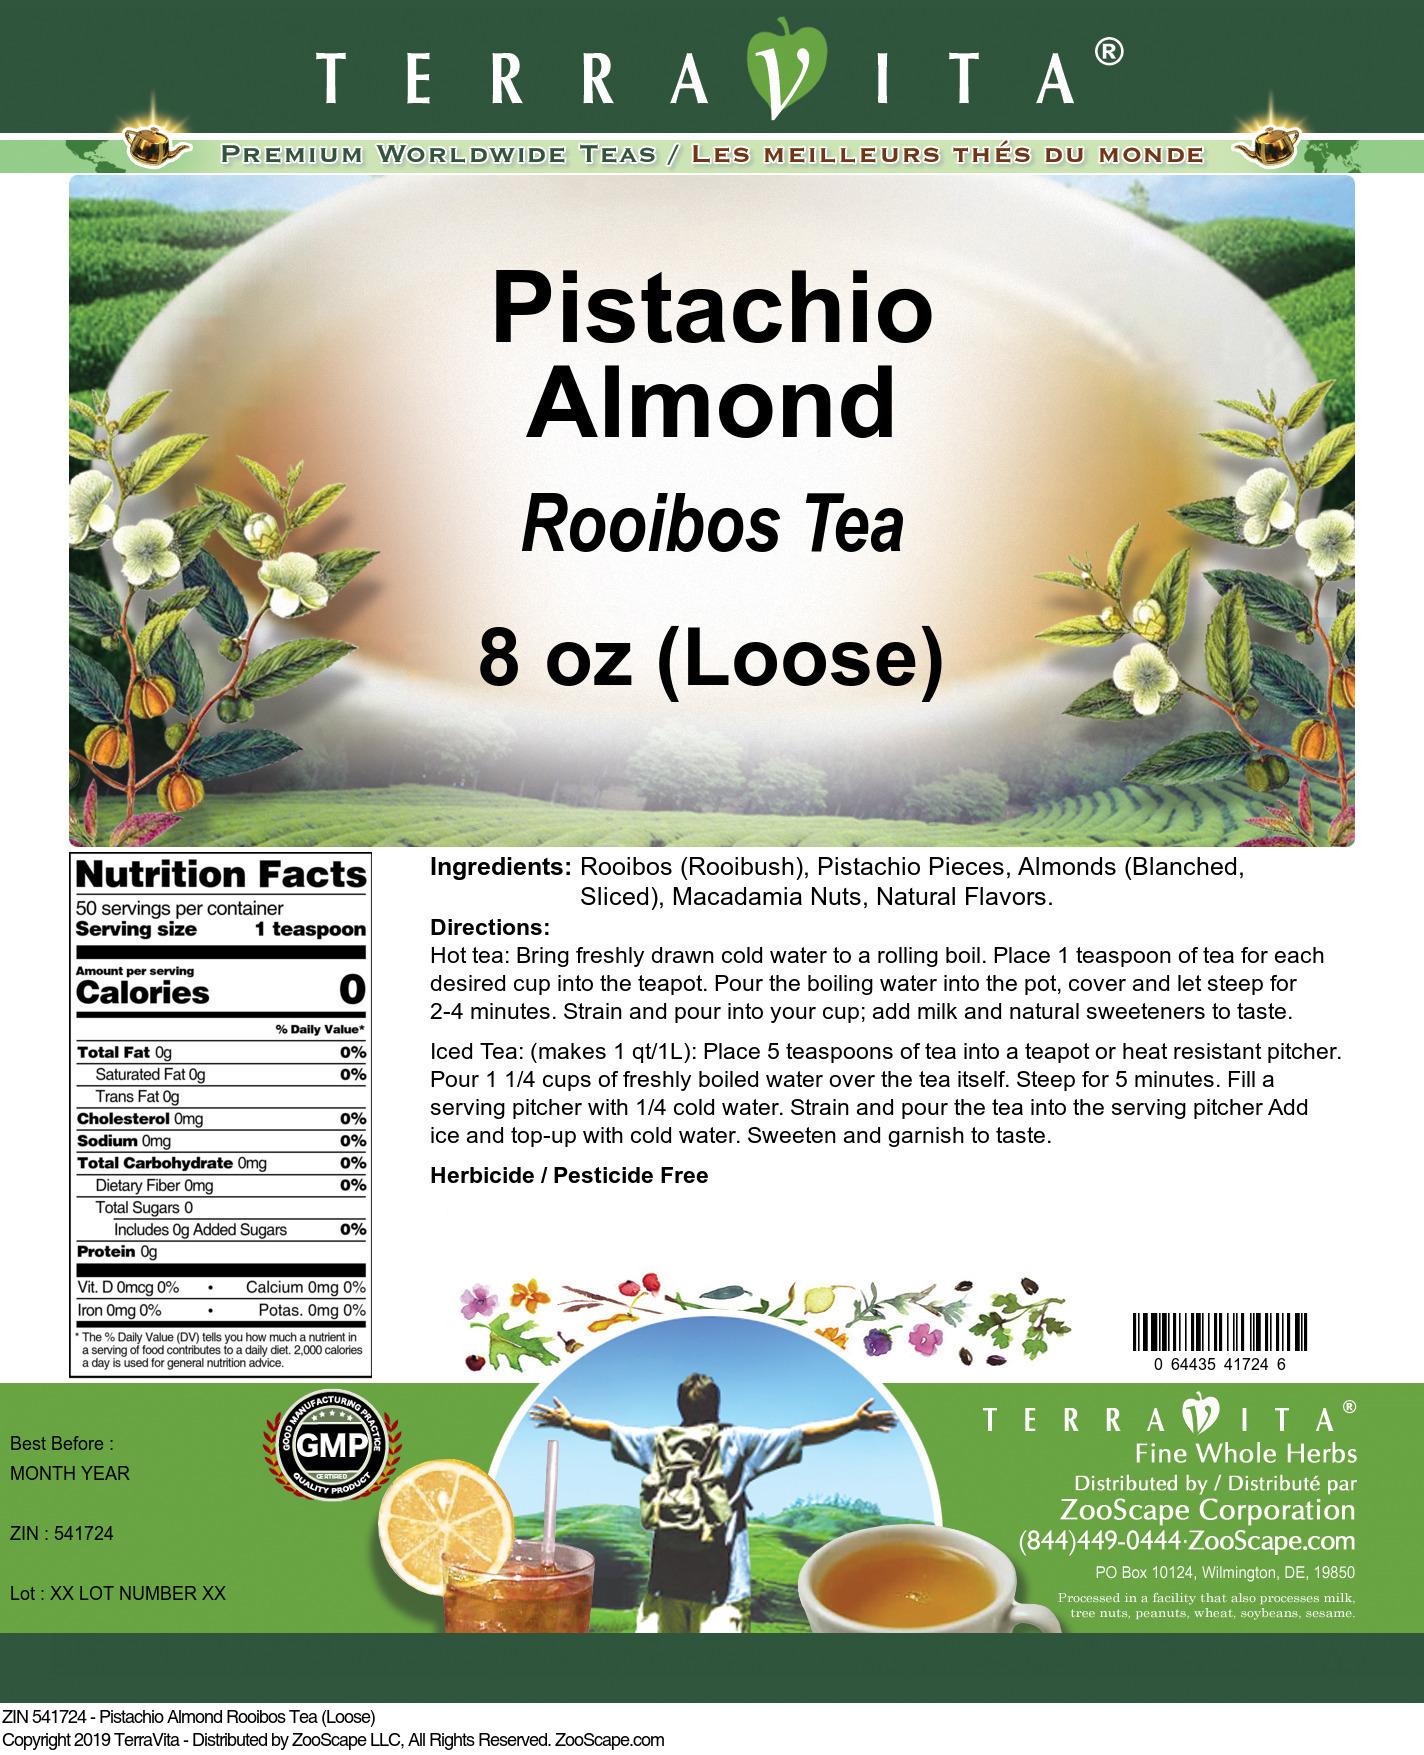 Pistachio Almond Rooibos Tea